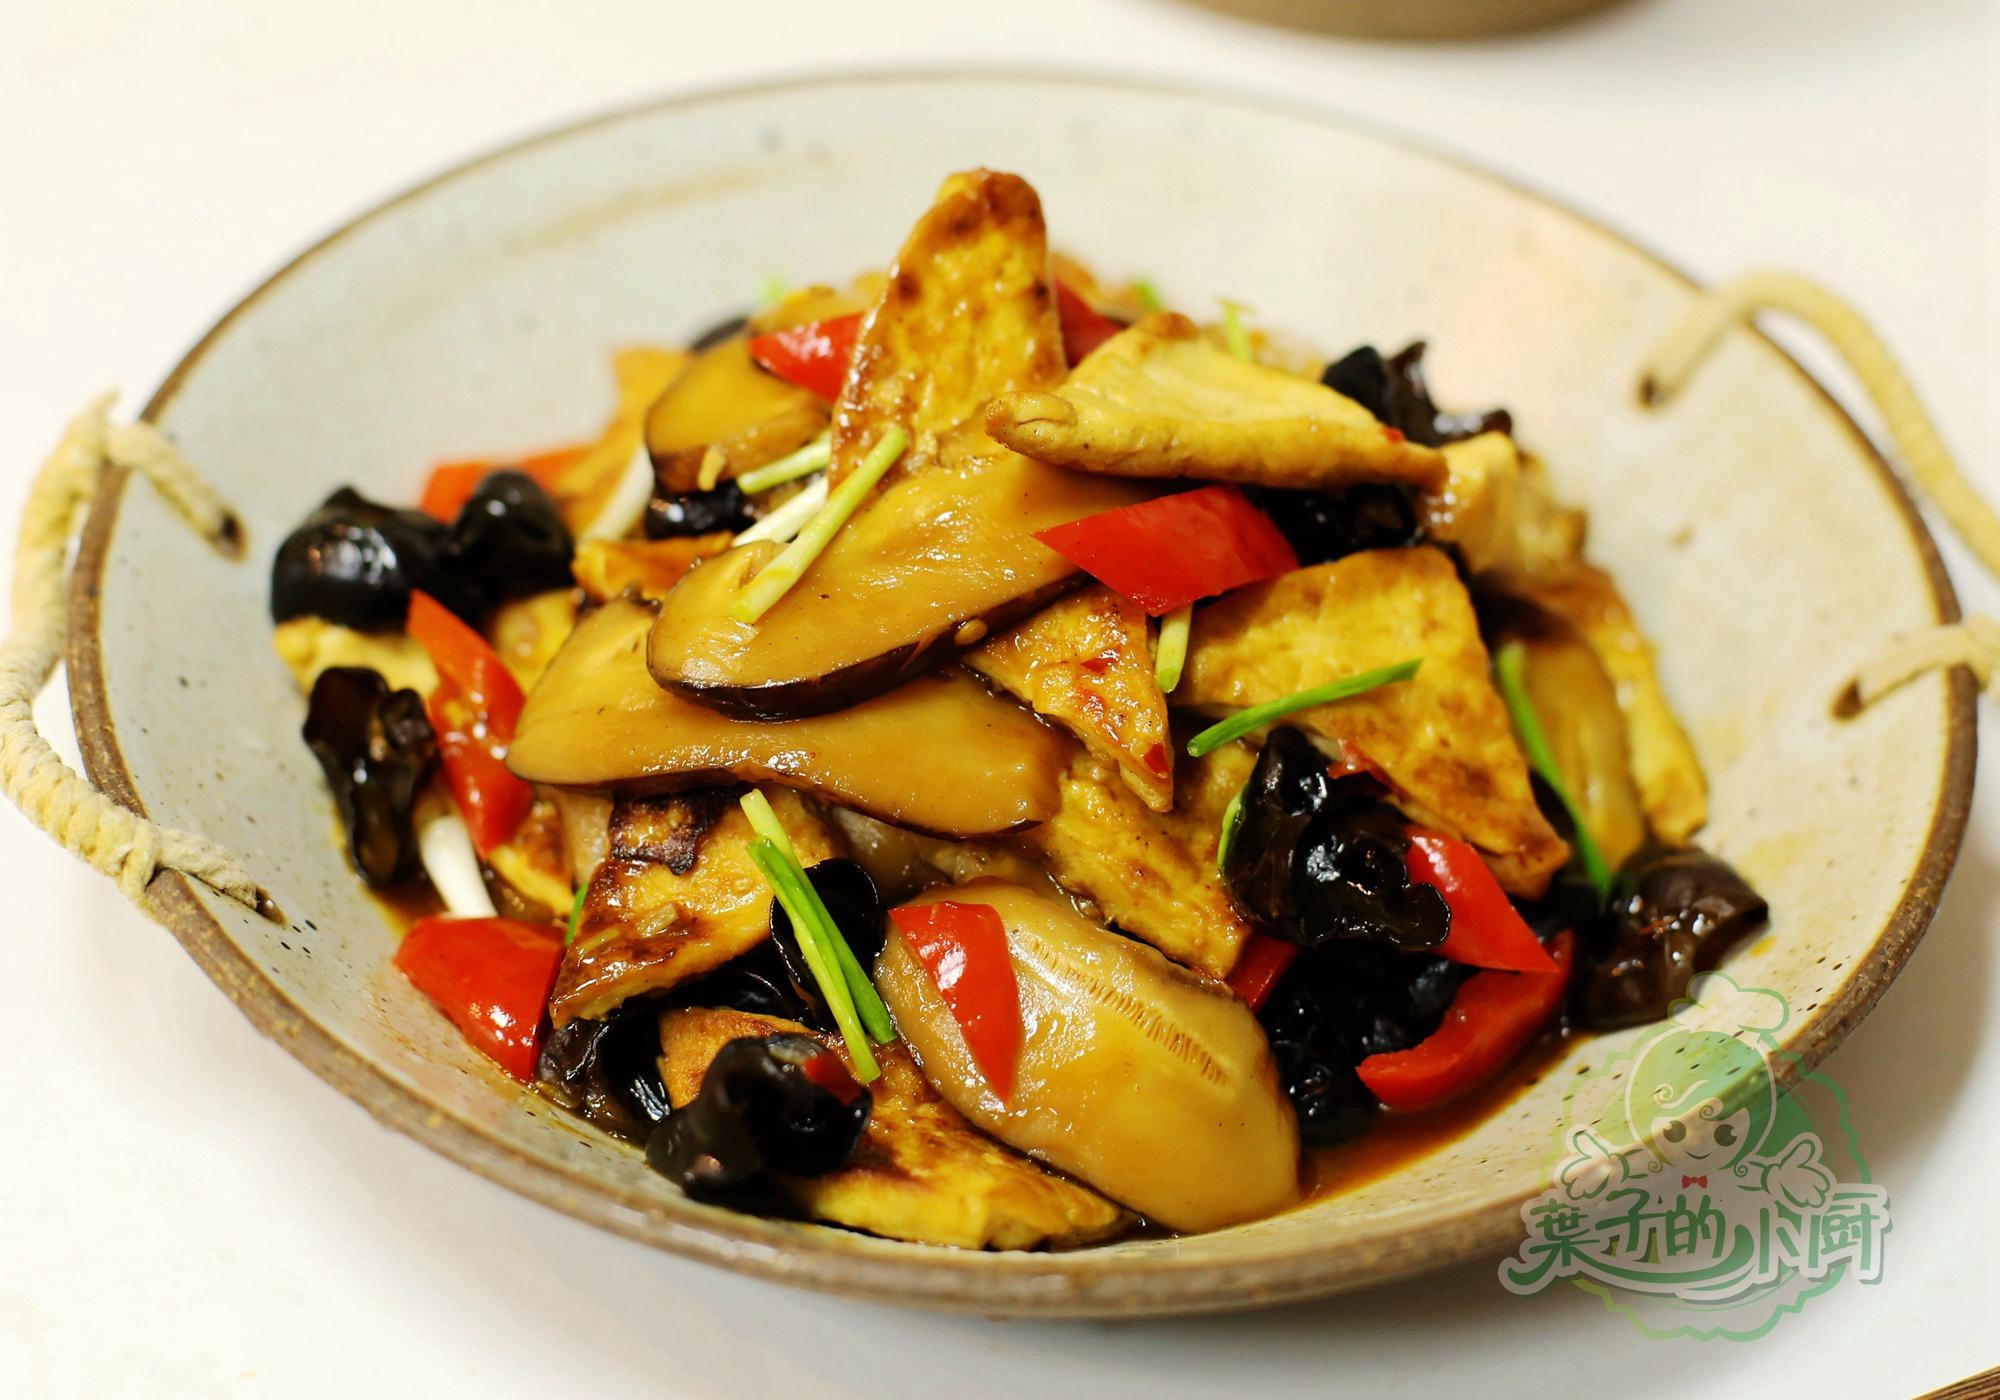 <b>一块豆腐、两个香菇,教您一招,比肉肉还好吃!</b>